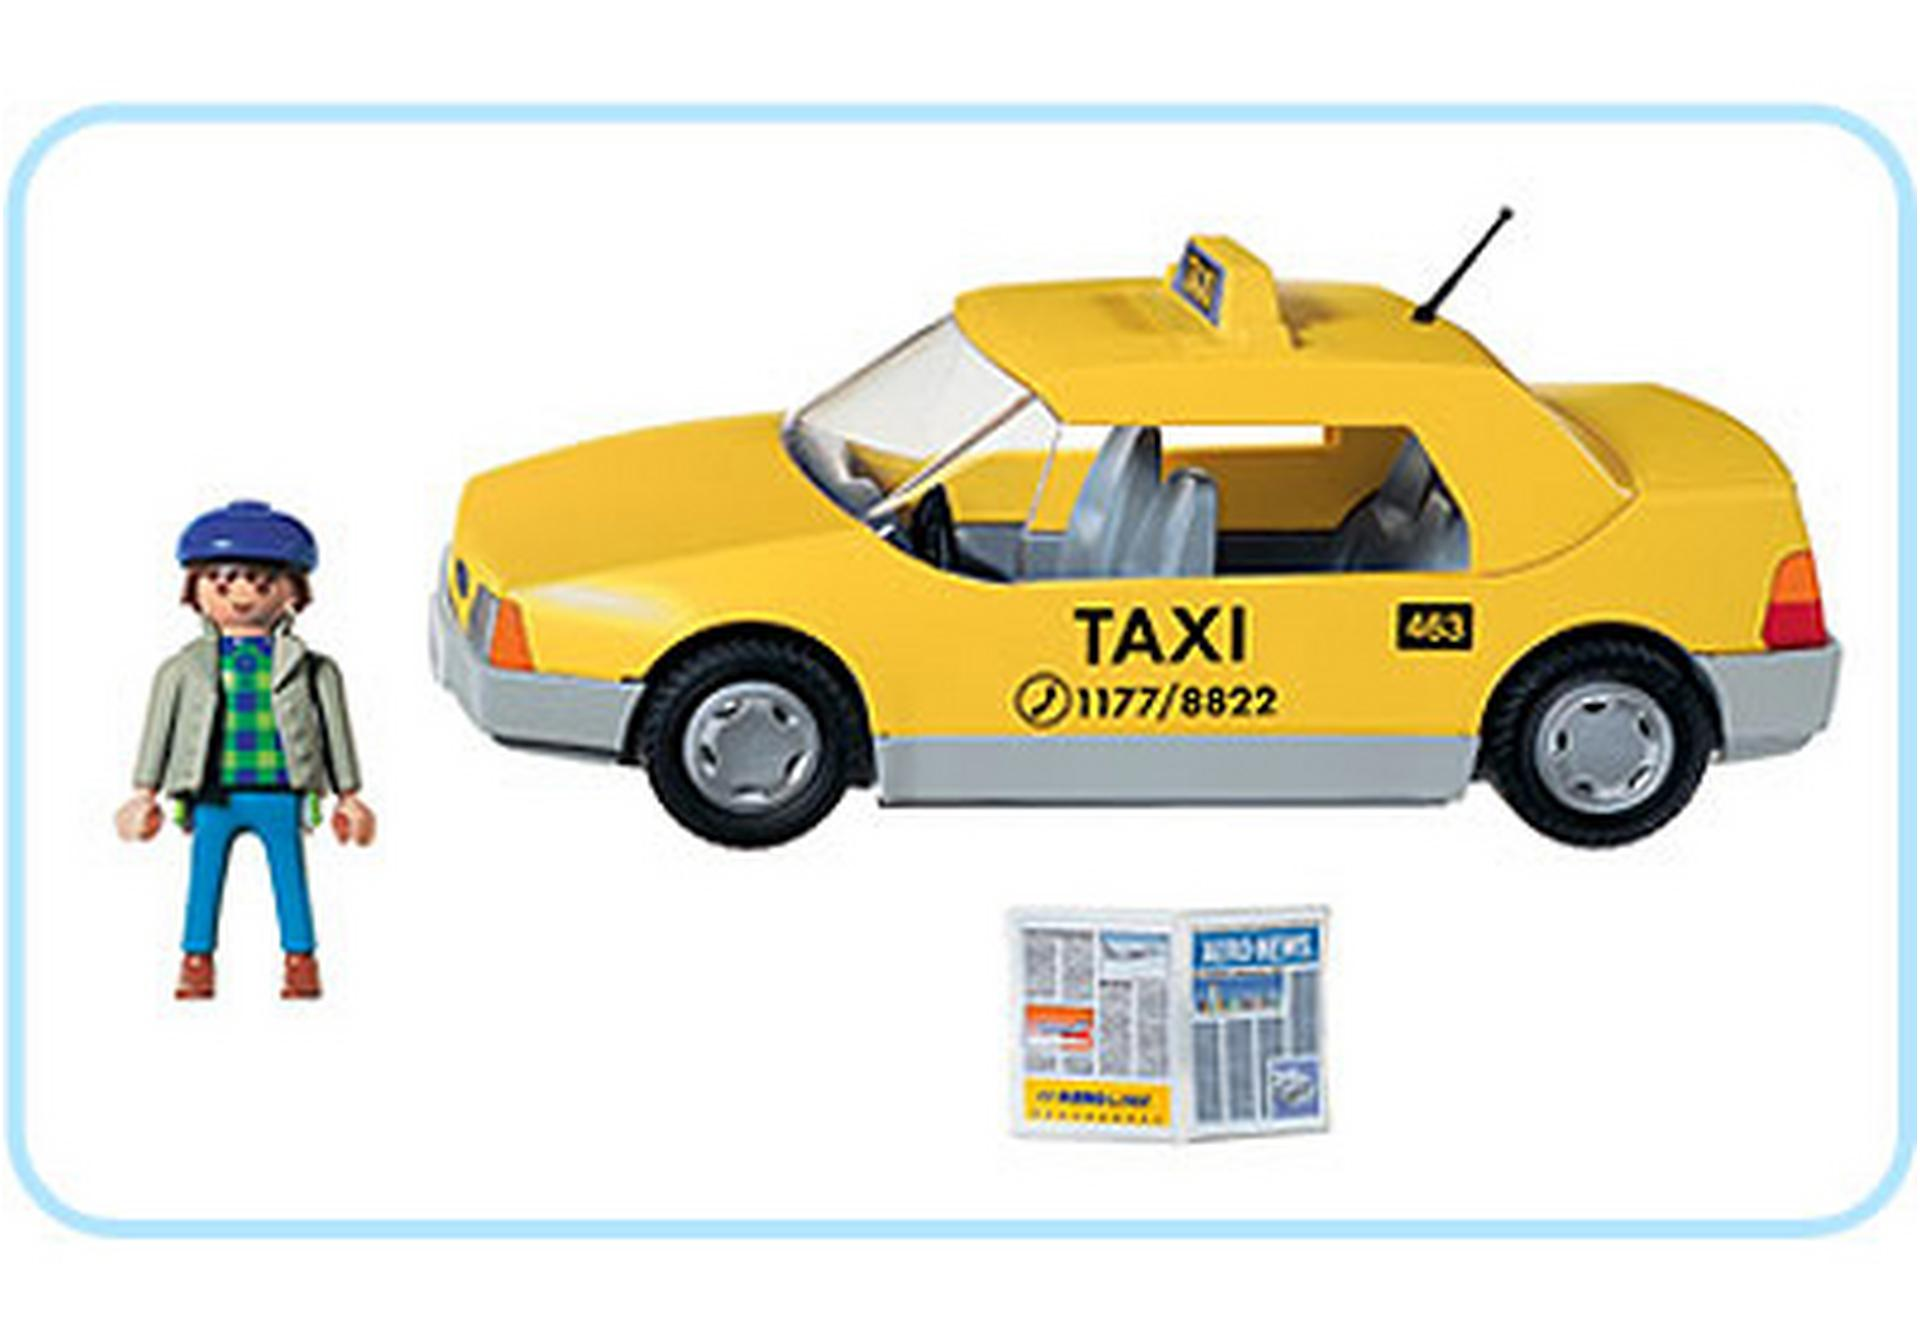 Taxi 3199 a playmobil deutschland for Jugendzimmer playmobil